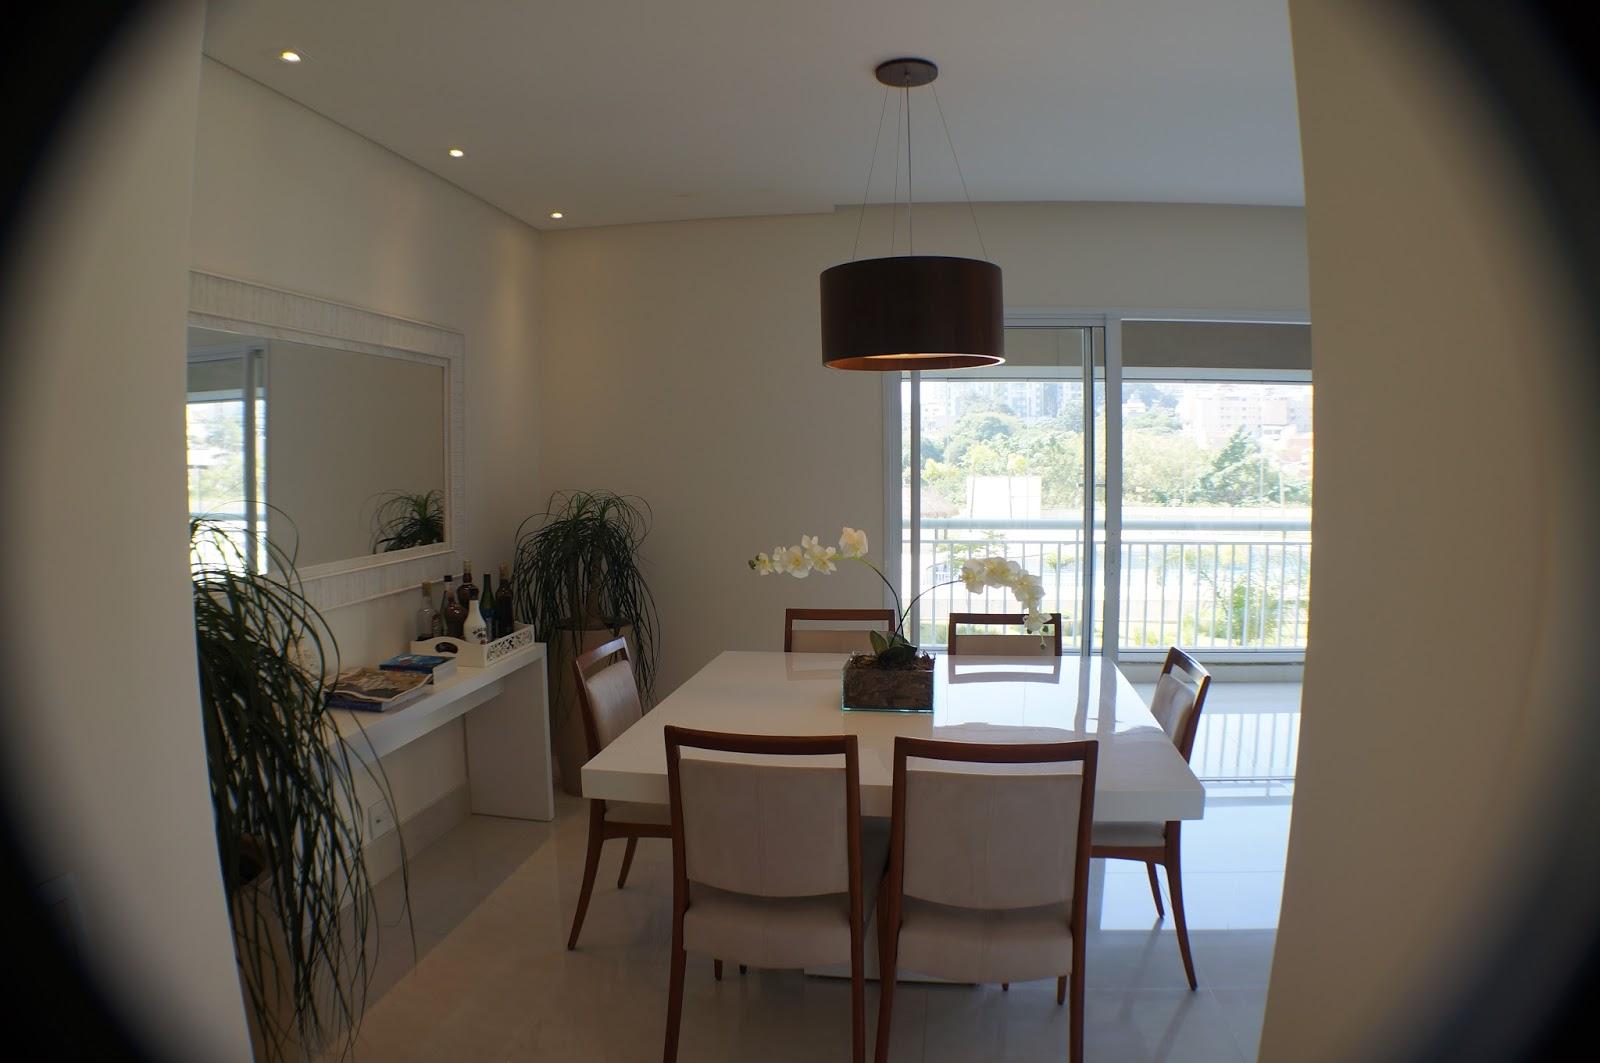 Sala de estar sala de jantar cozinha e varanda gourmet integradas  #506B7B 1600x1063